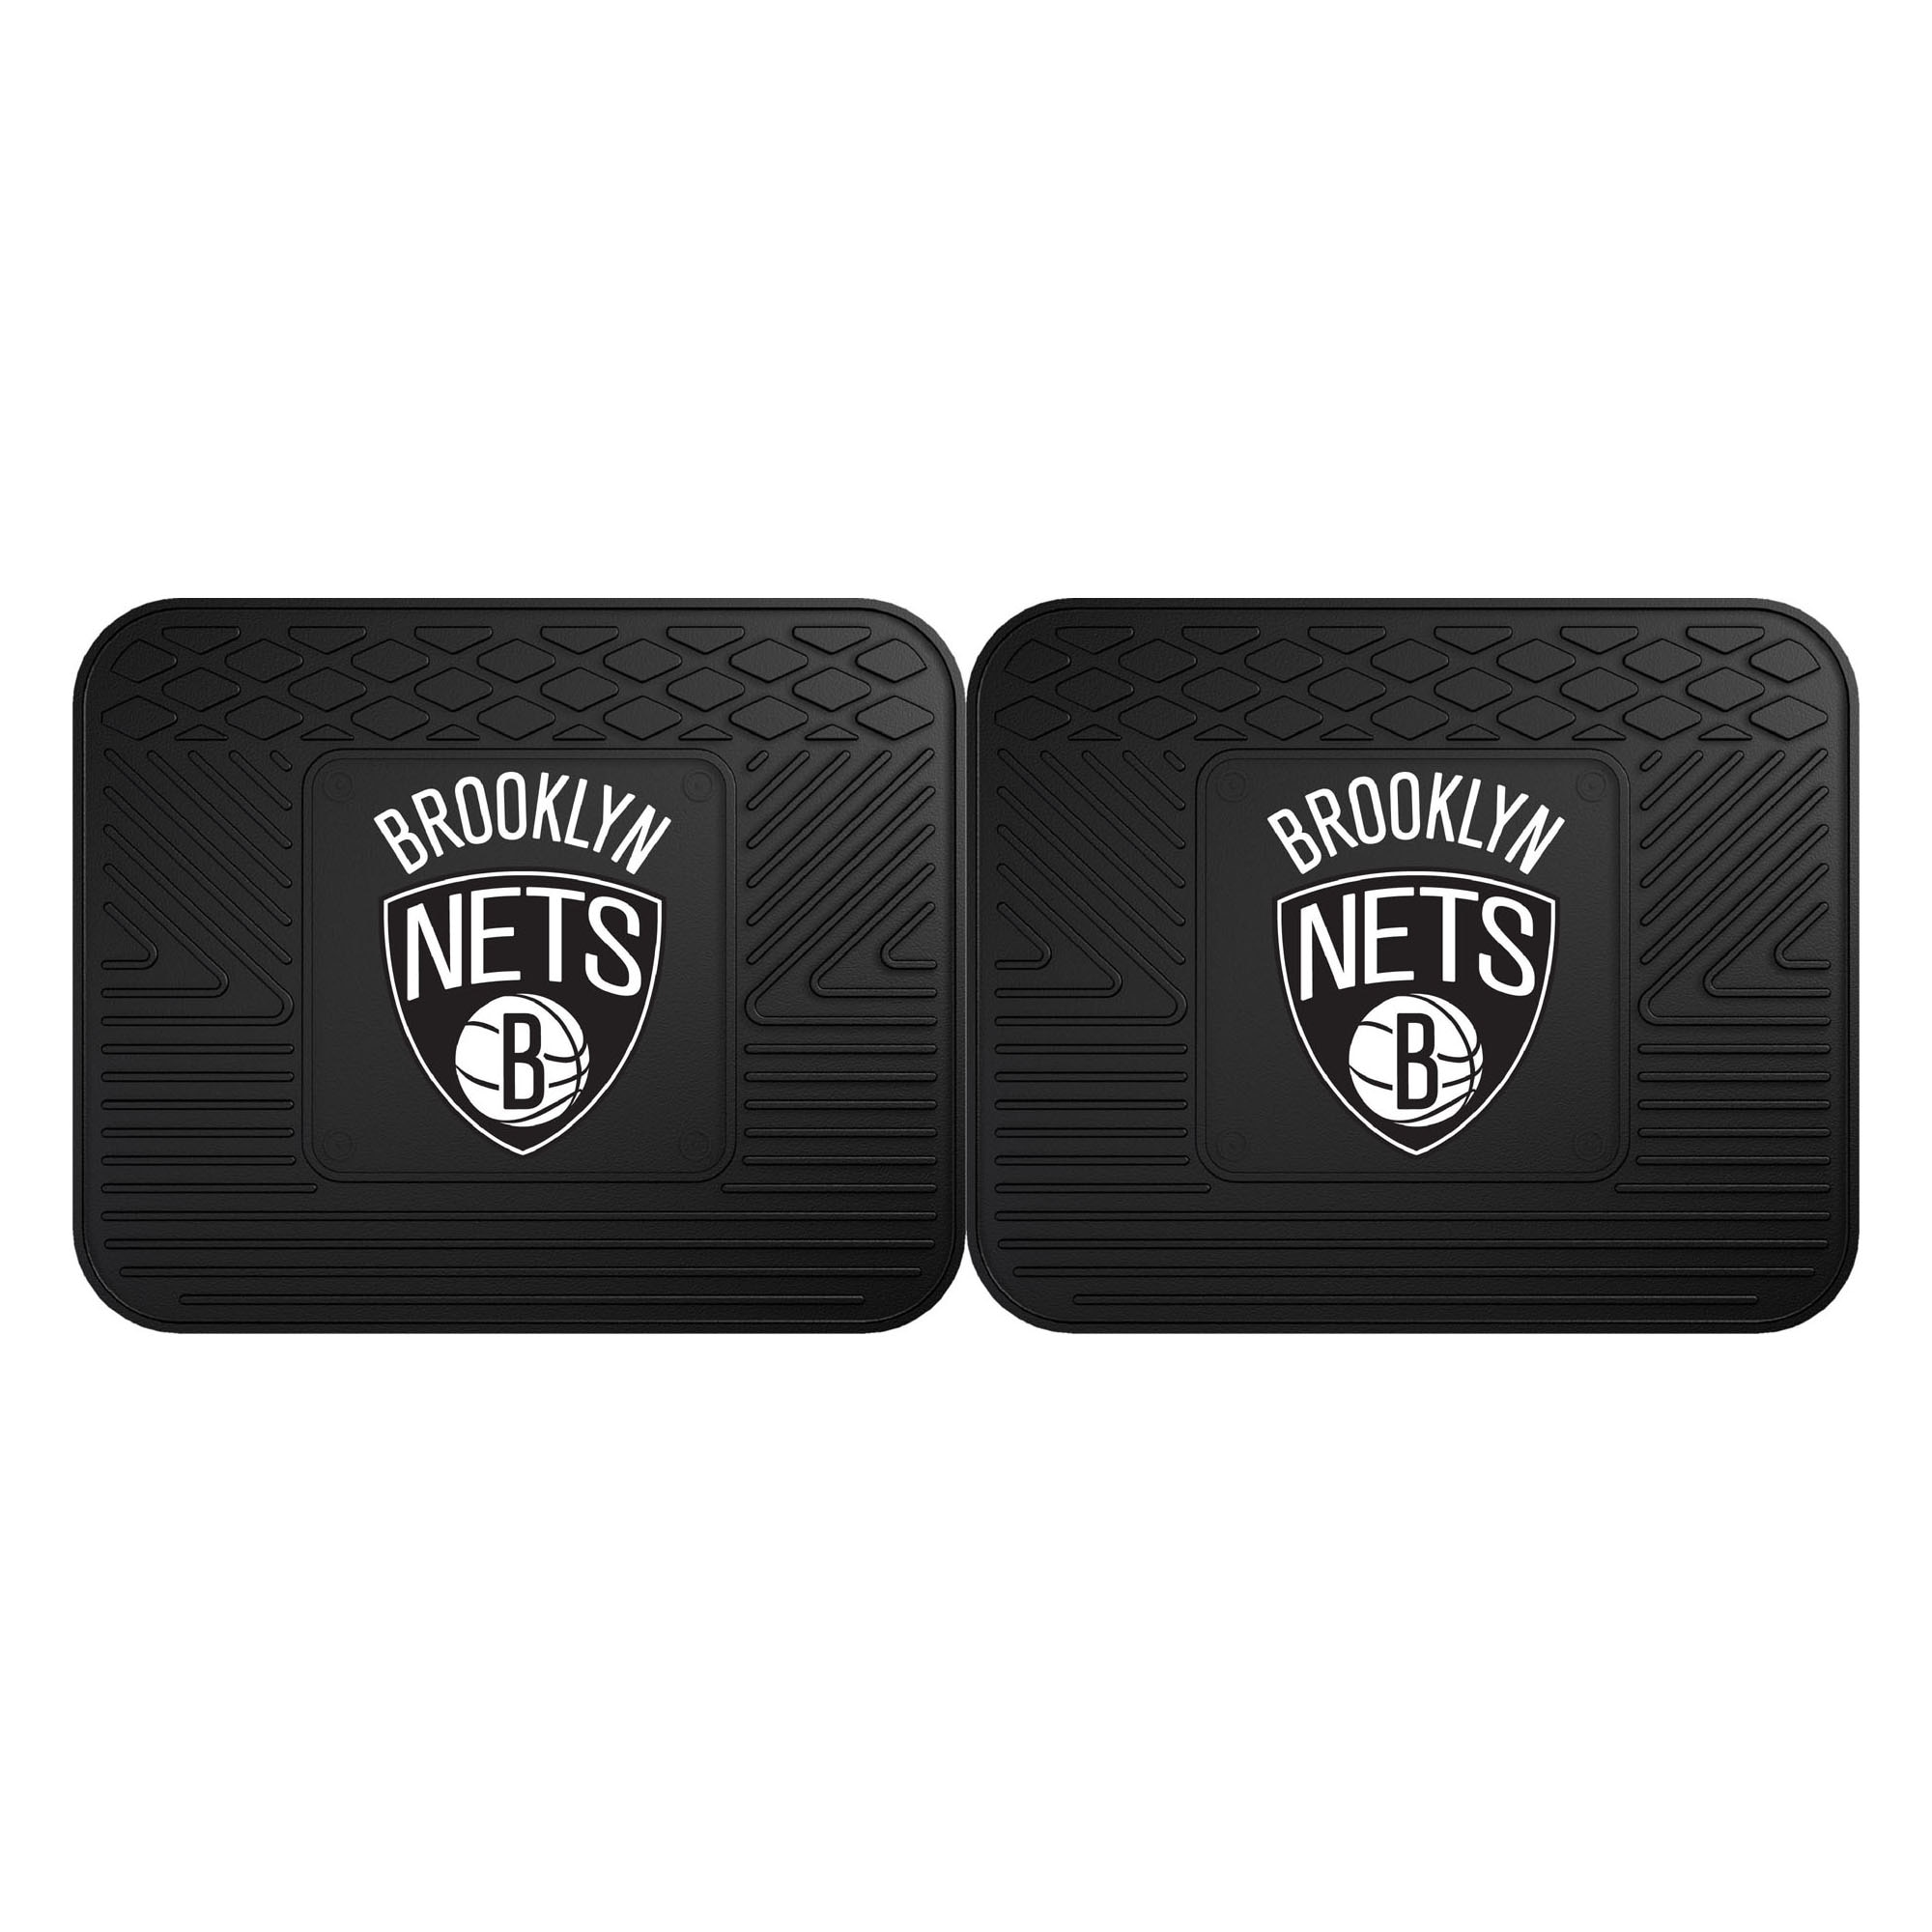 Brooklyn Nets 2-Pack Utility Mat Set